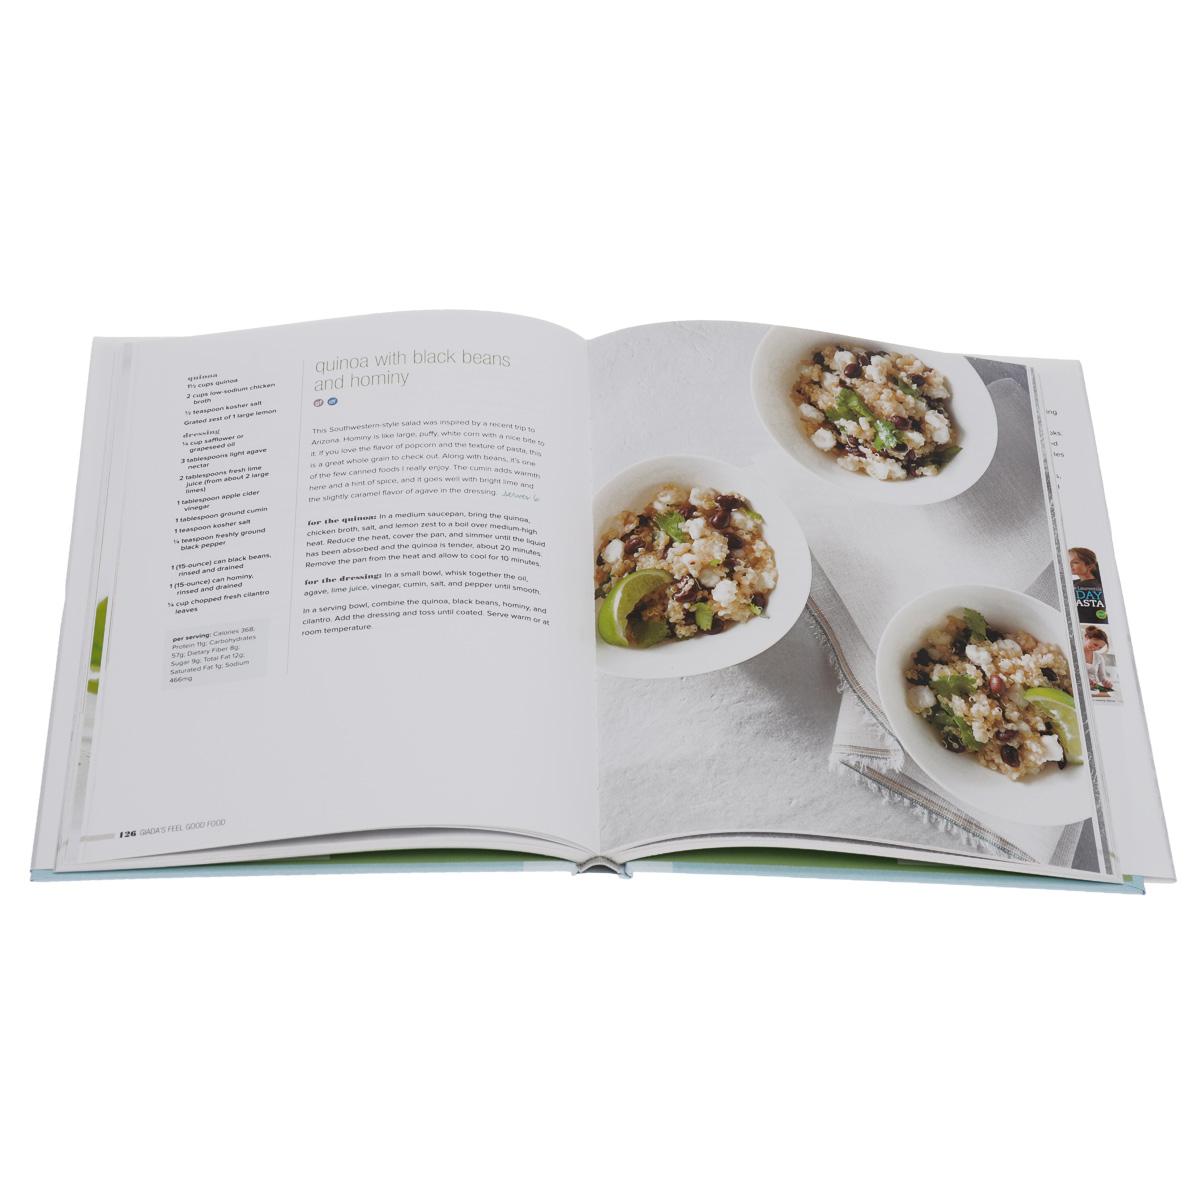 Giadas's Feel Good Food: My Healthy Recipes and Secrets